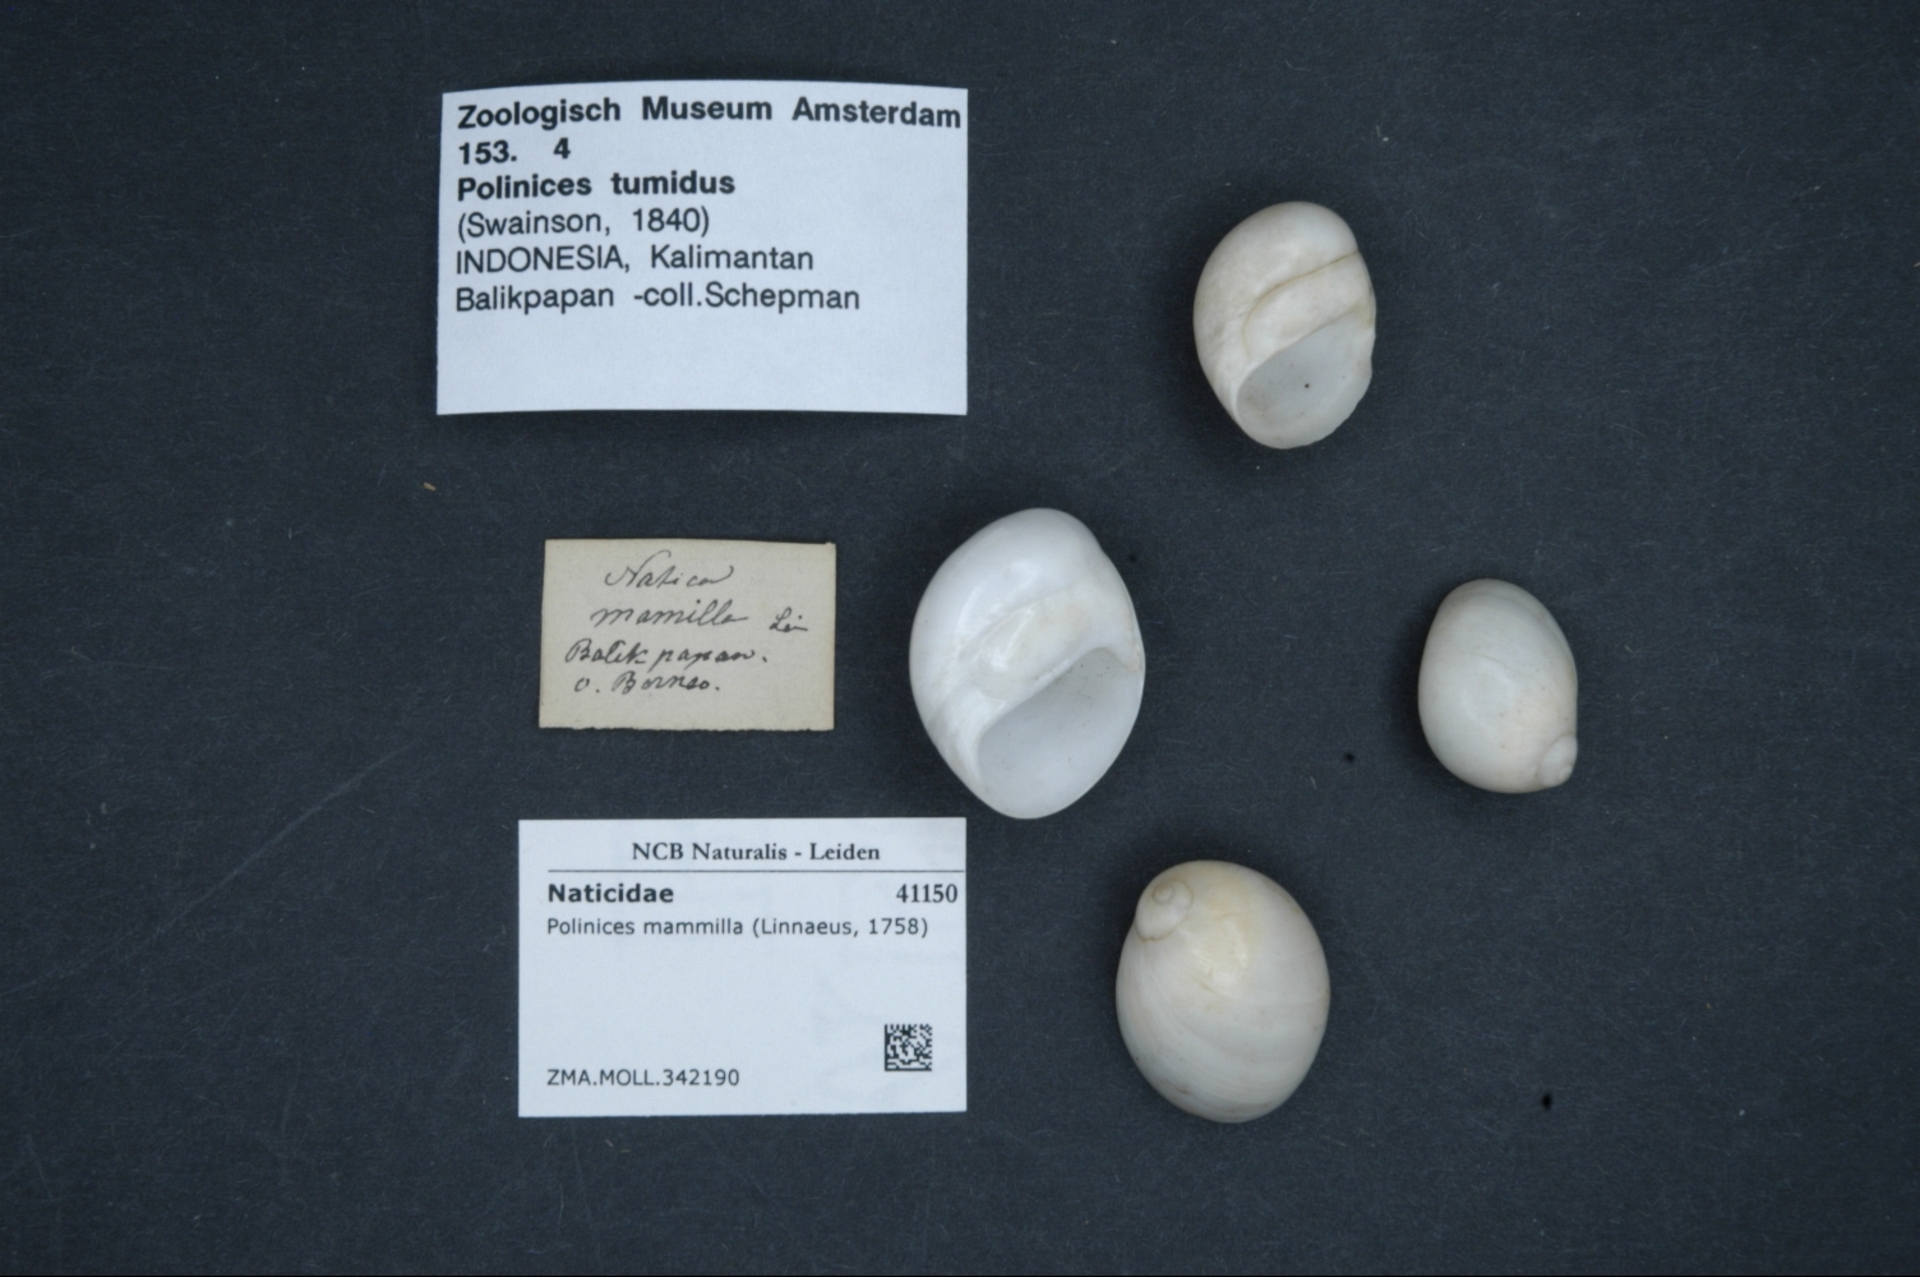 ZMA.MOLL.342190 | Polinices mammilla (Linnaeus, 1758)